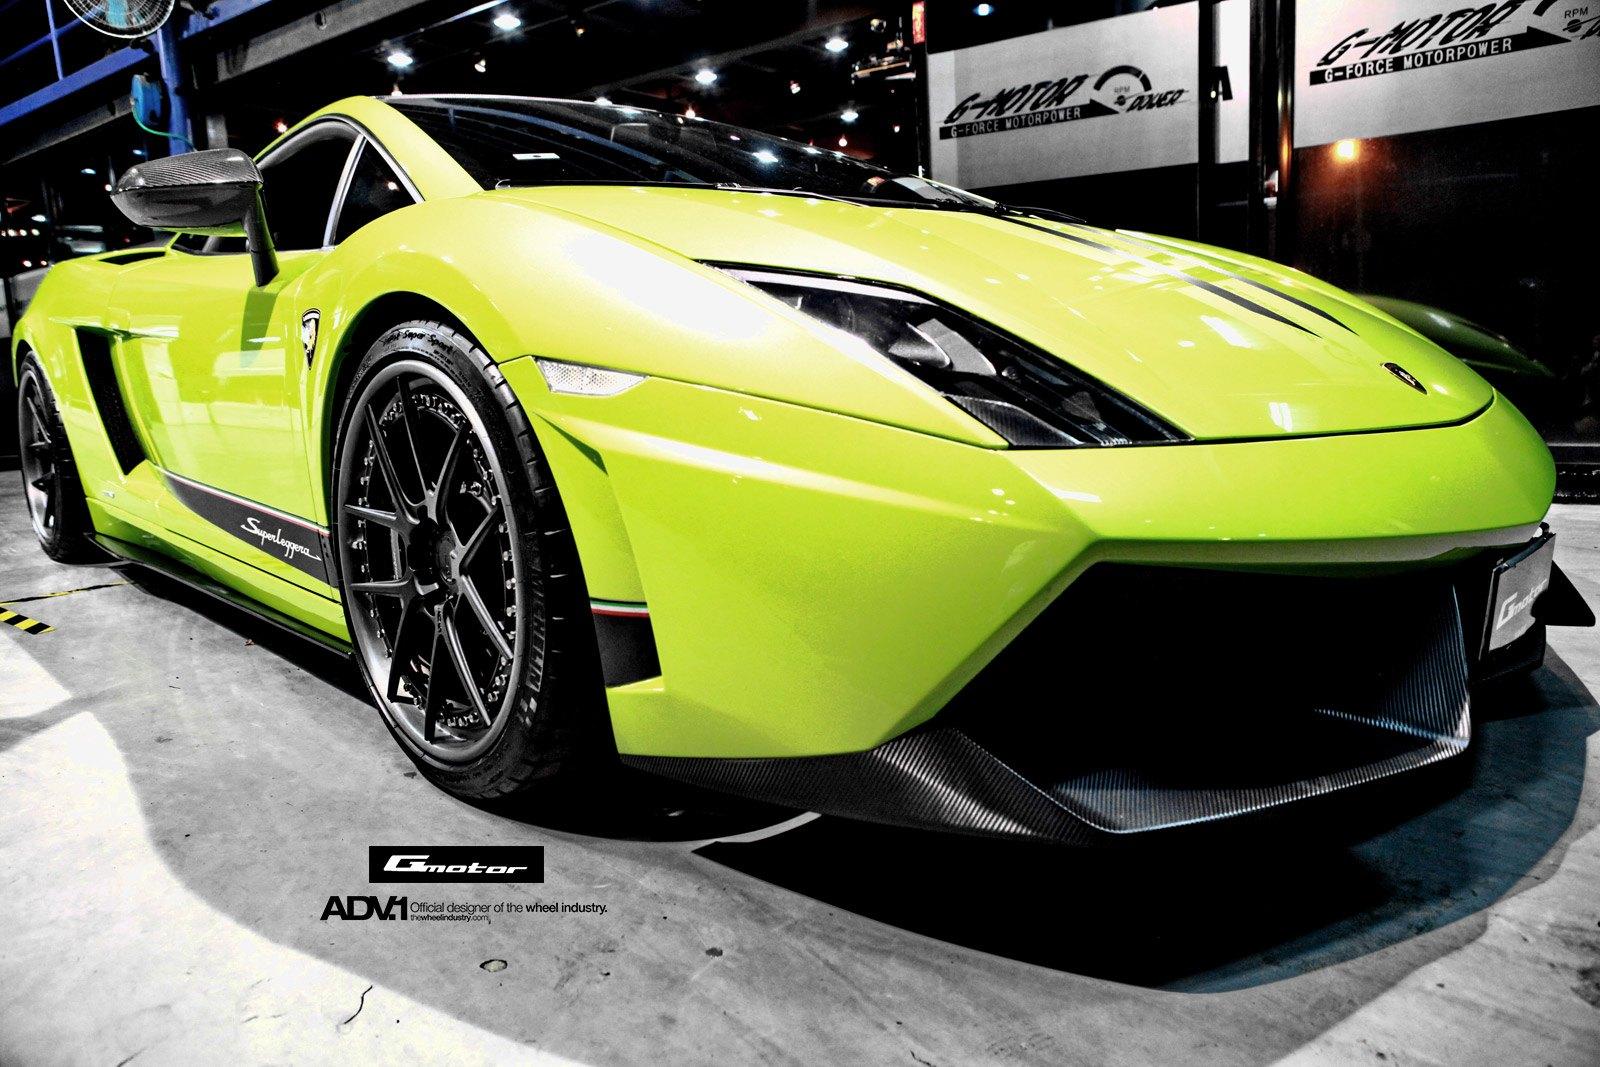 Special Edition Lime Green Lamborghini Gallardo Superleggera Gets